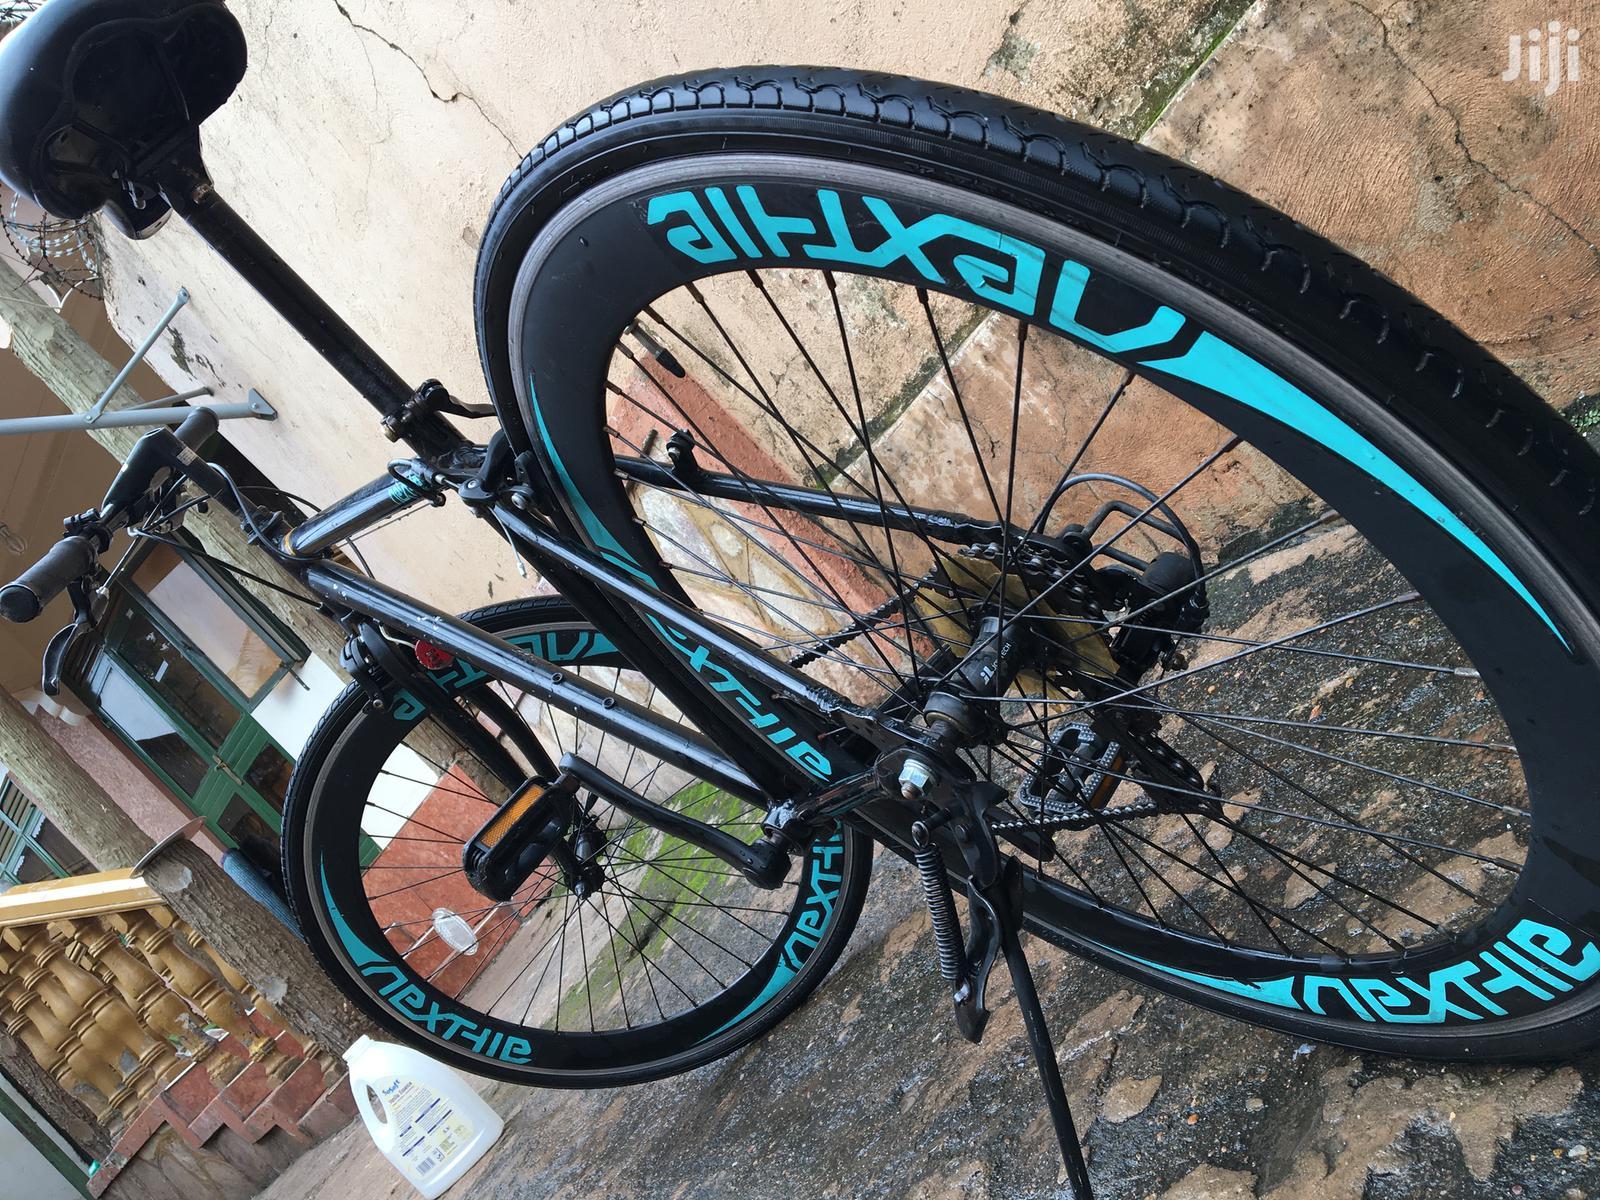 Nexthie Black Sport Road Bike.